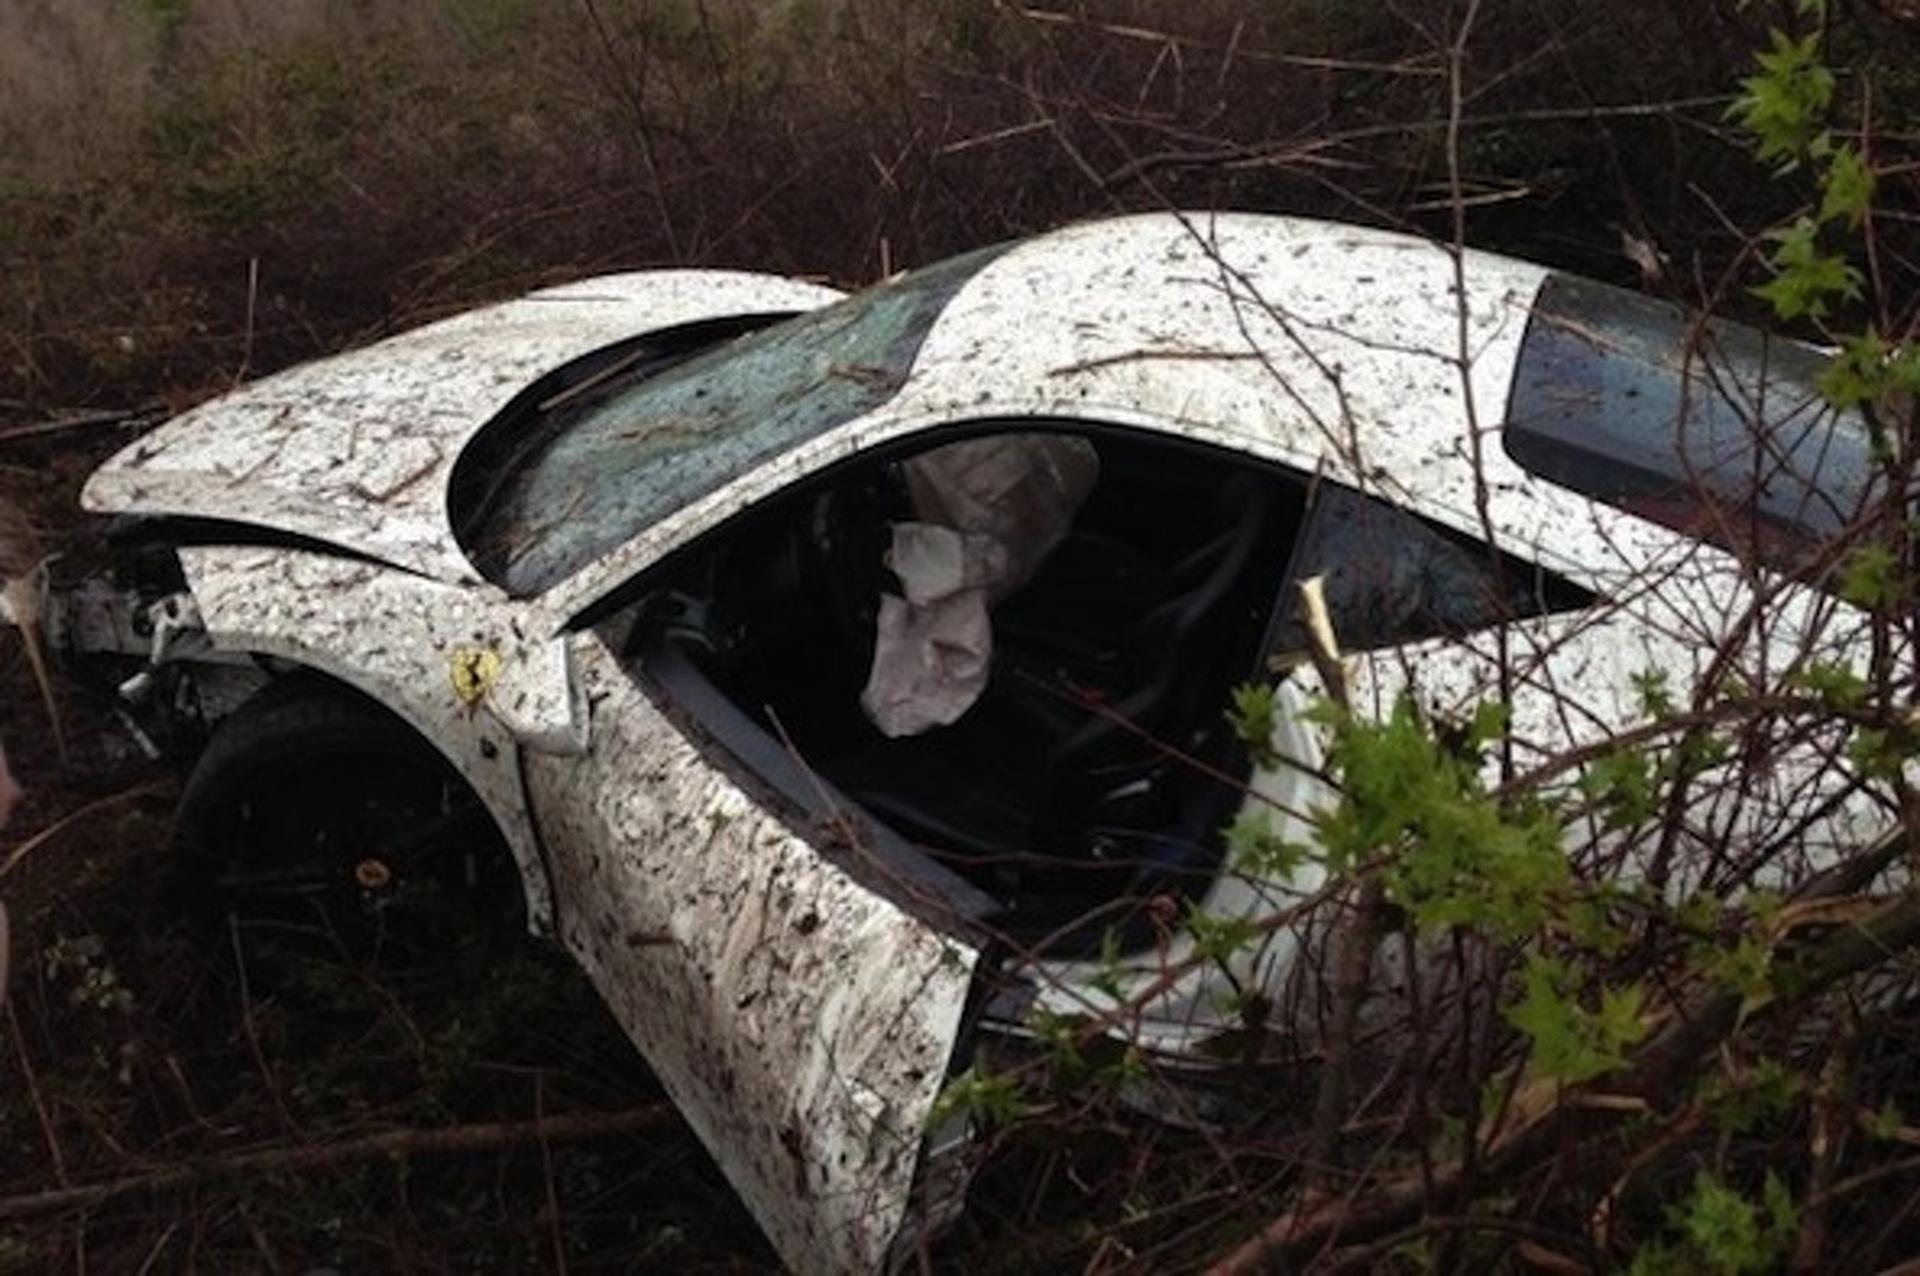 Underground Racing Ferrari 458 Wrecked at Amelia Island Airport